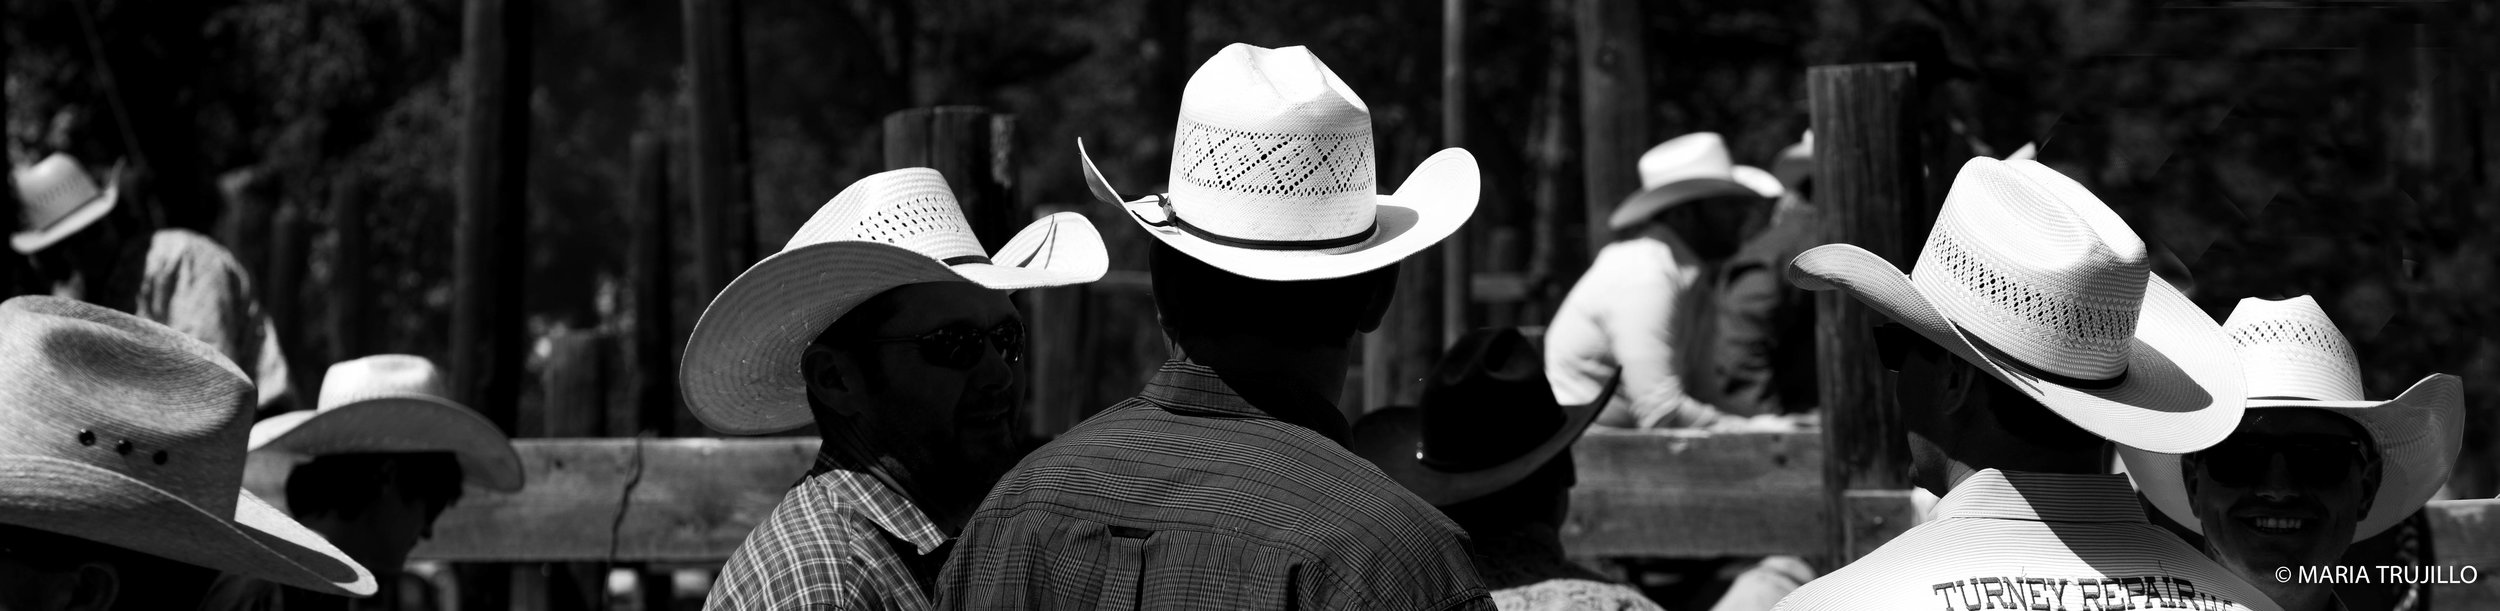 augusta rodeo 2016-7.jpg